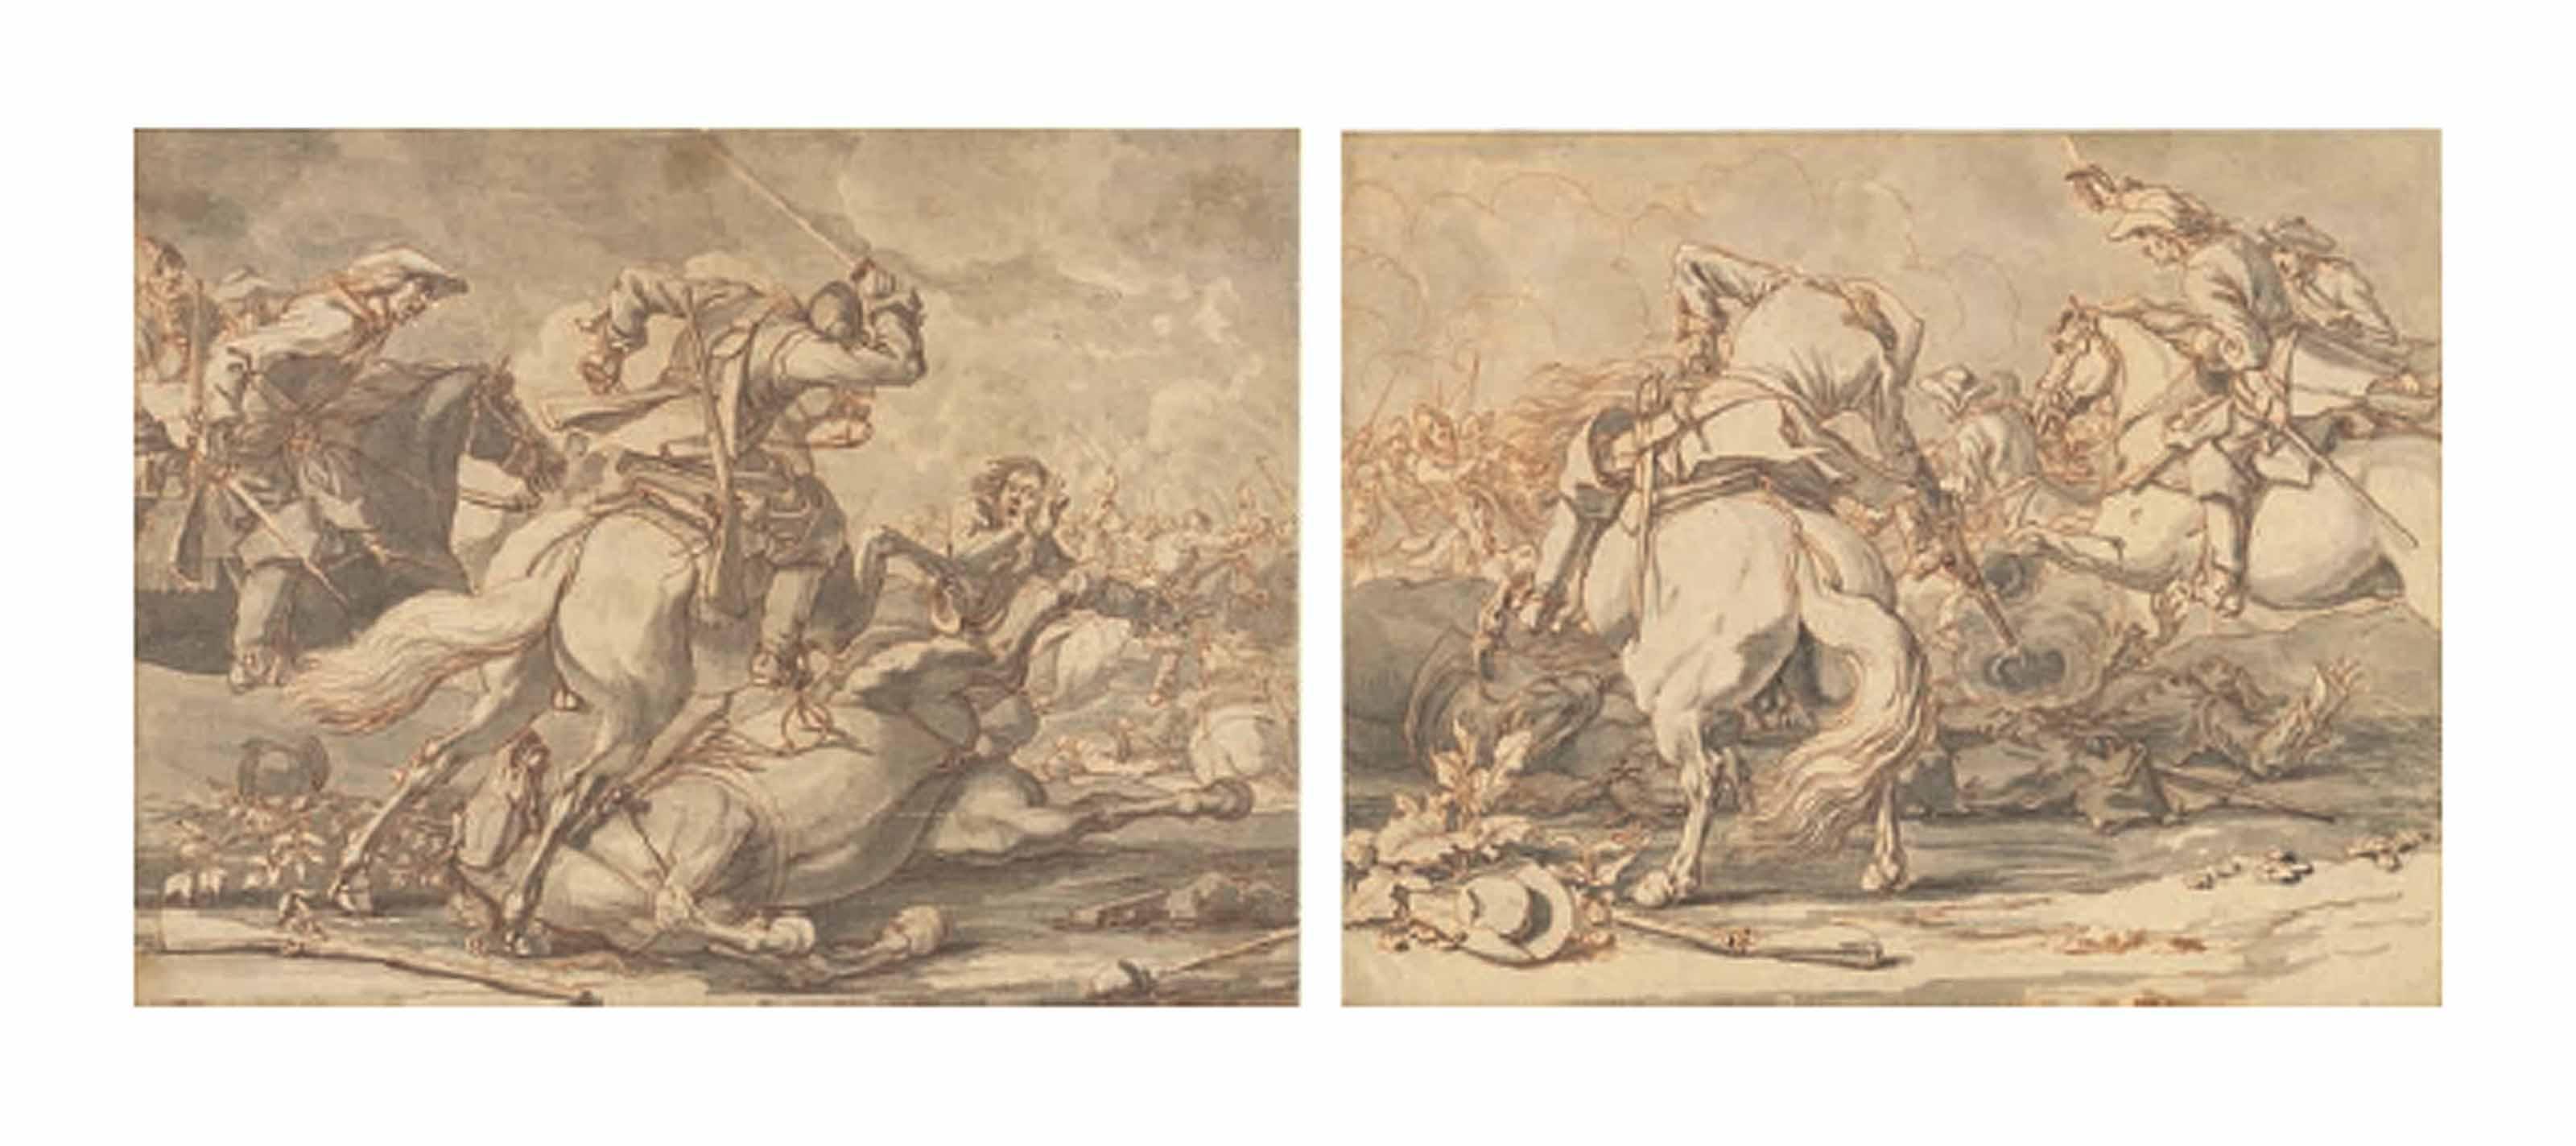 Cavalry skirmishes